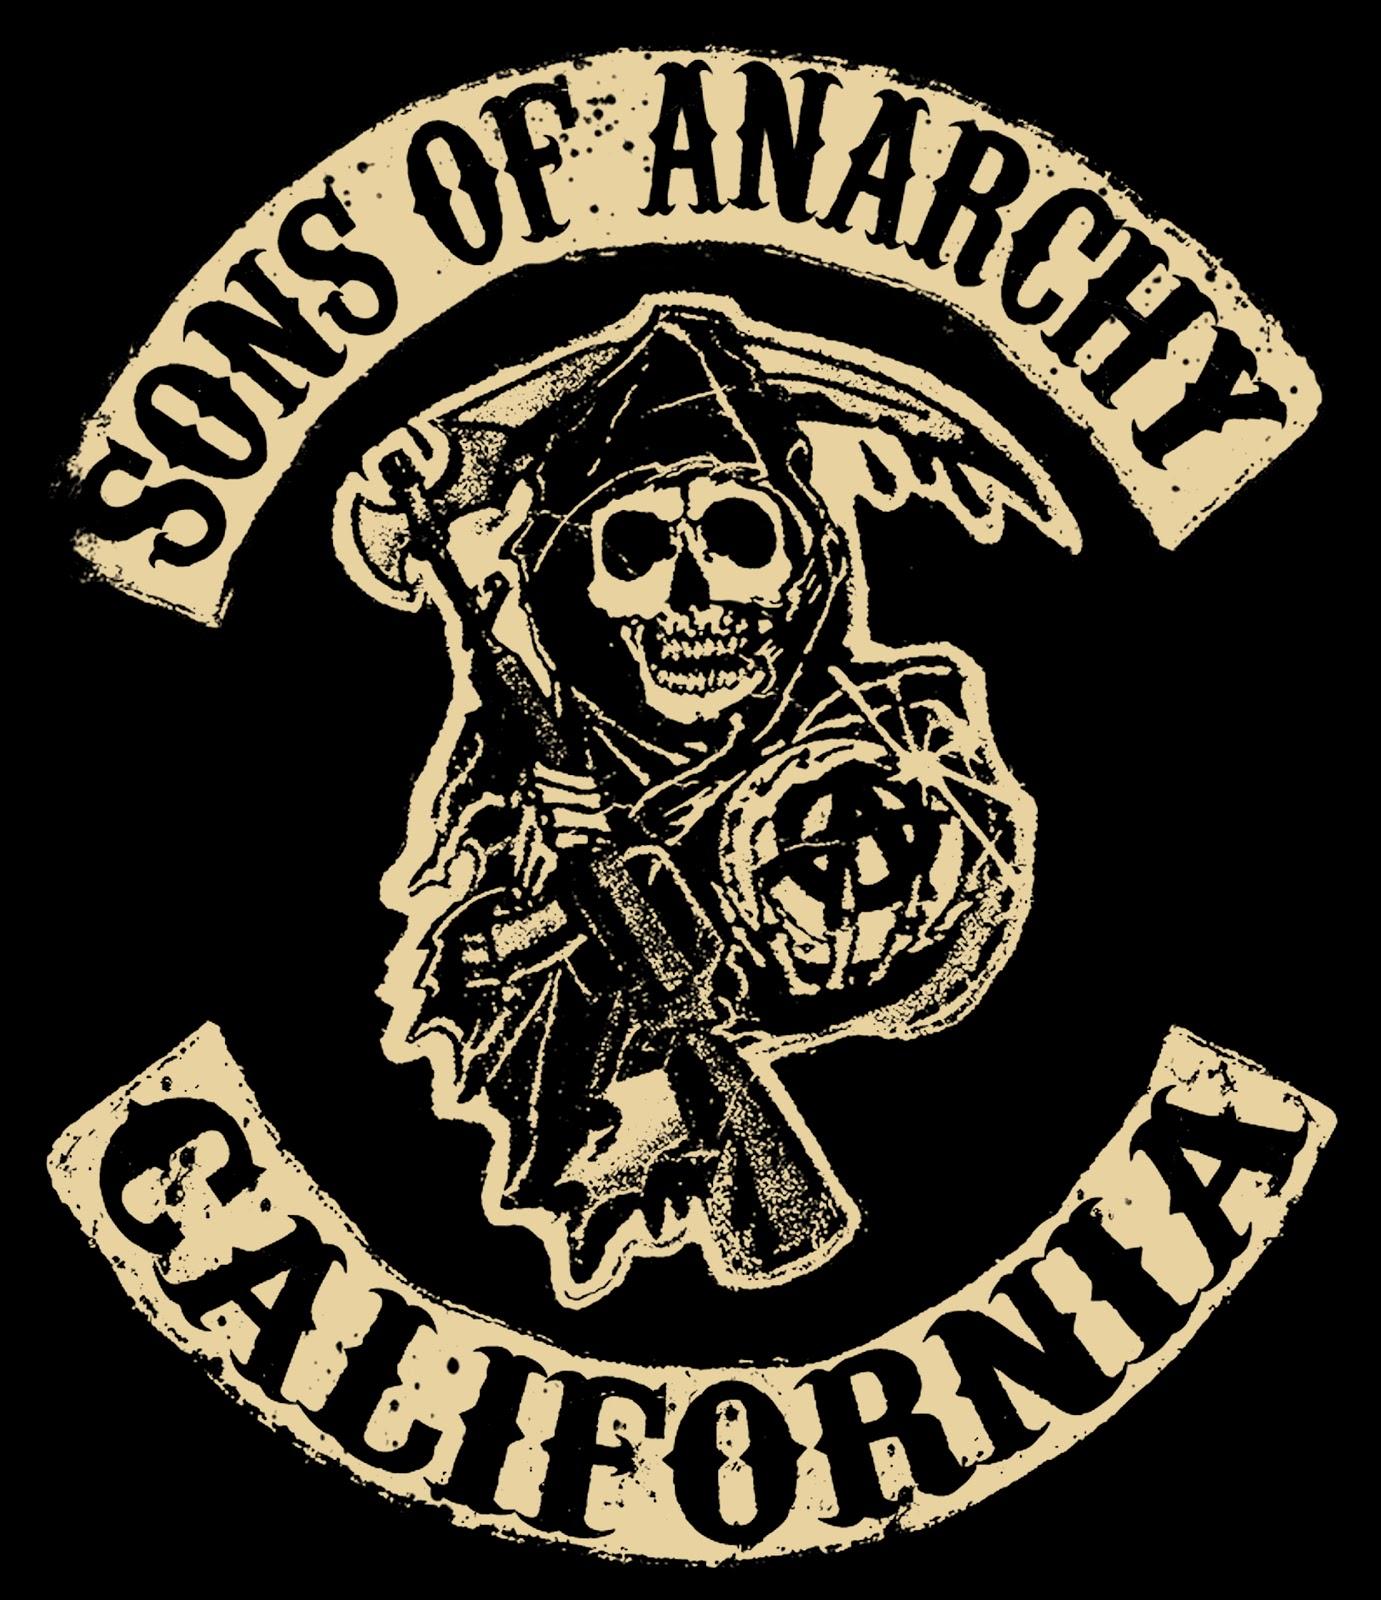 Sam Crow Sons Of Anarchy